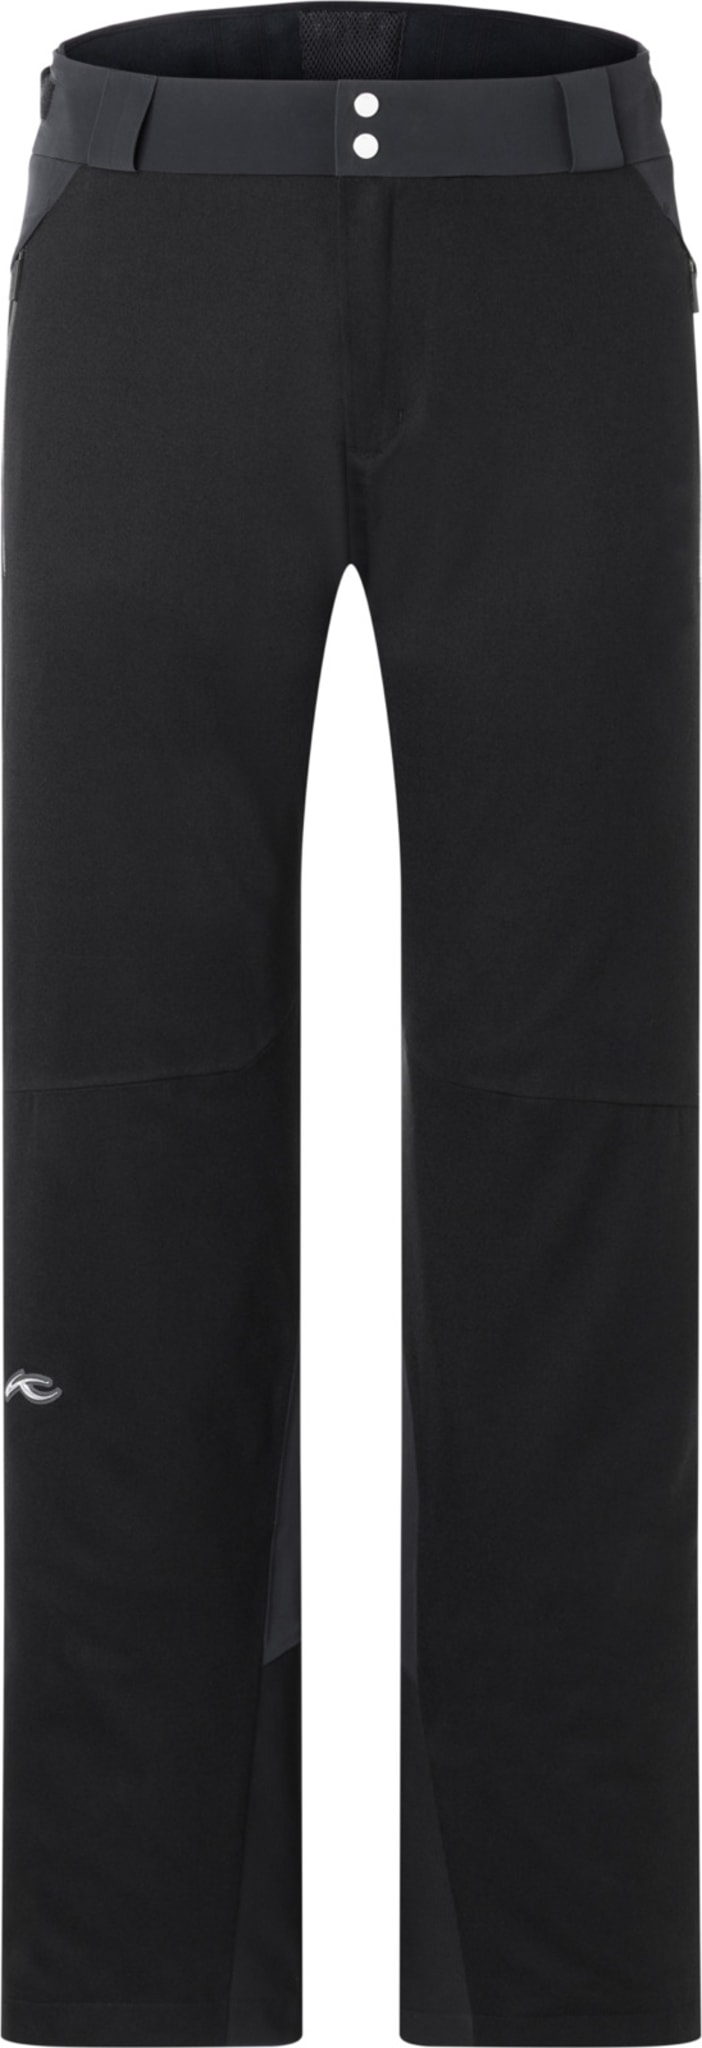 Linard Pants Men